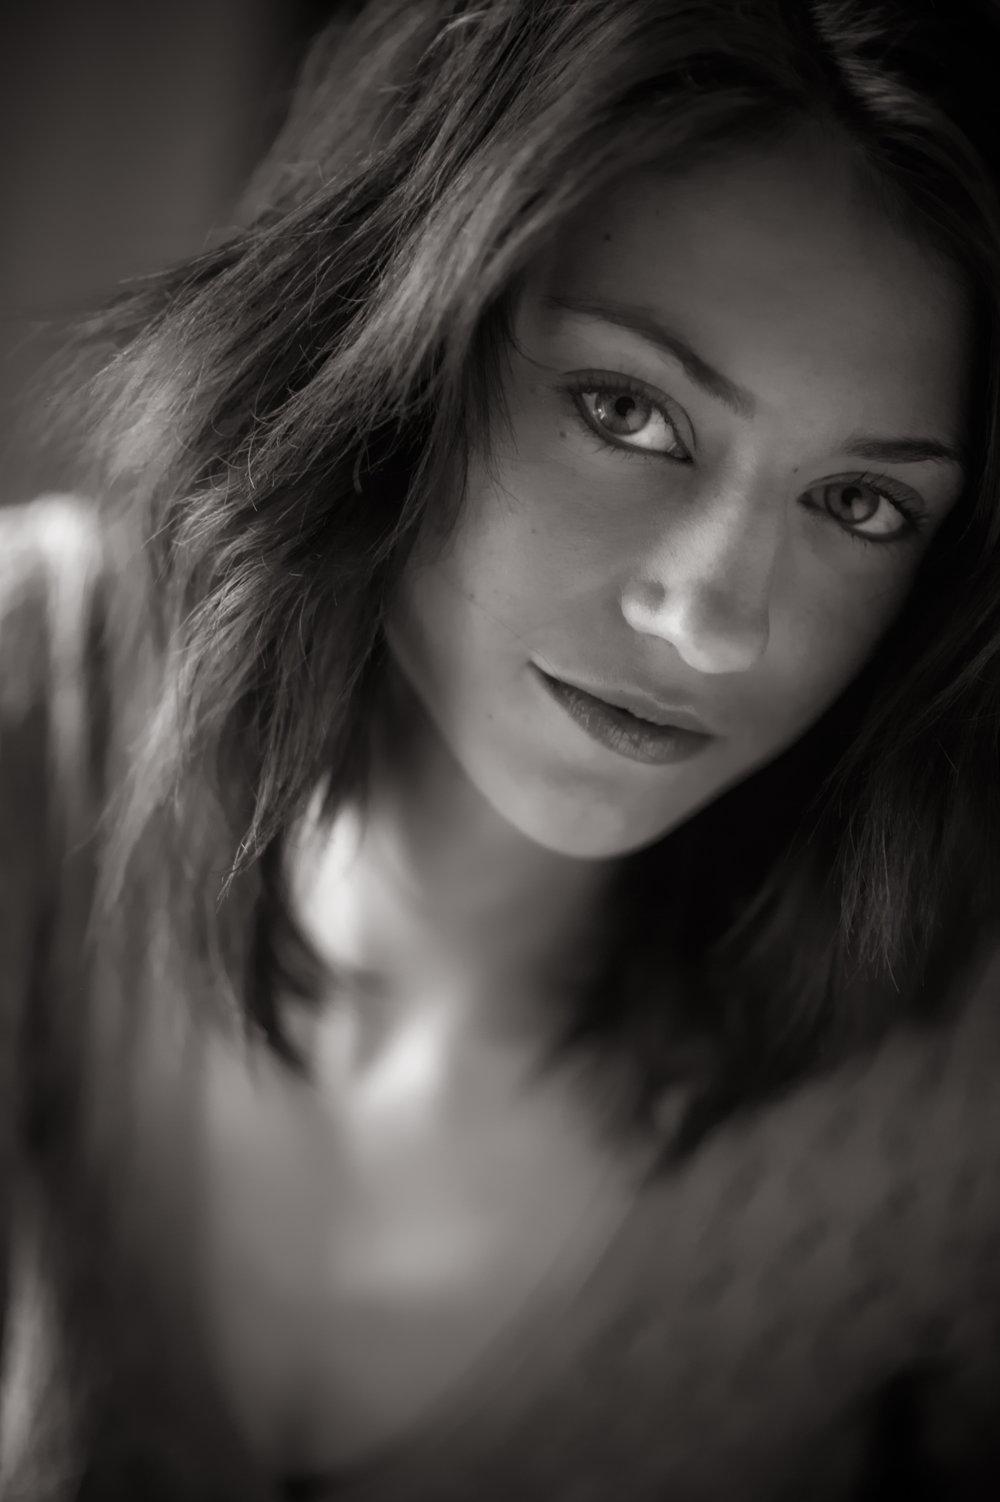 Marta-Hewson-Lifestyle-portrait-Maggie-Mae-Taylor-seductive-glance.JPG